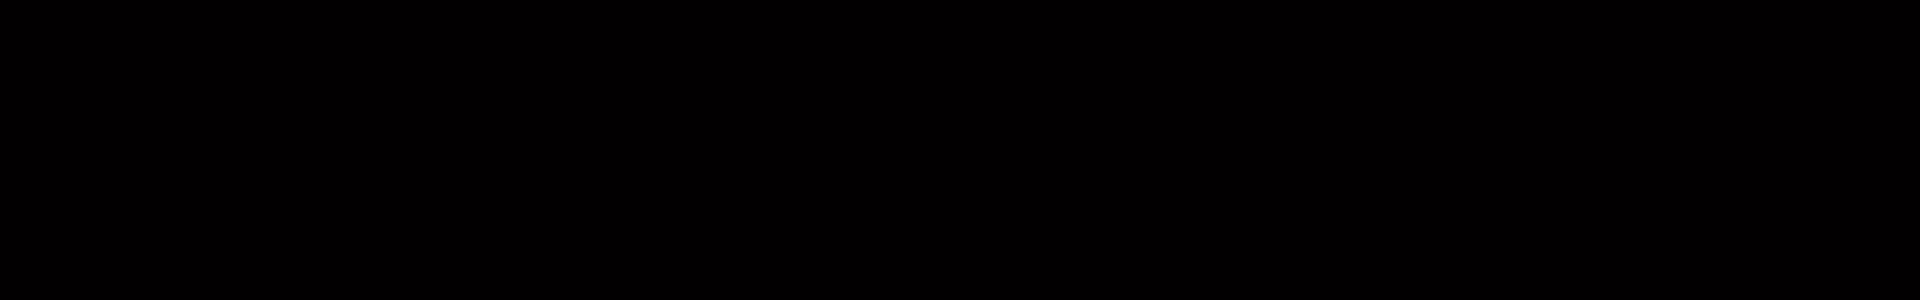 Slider Background Black